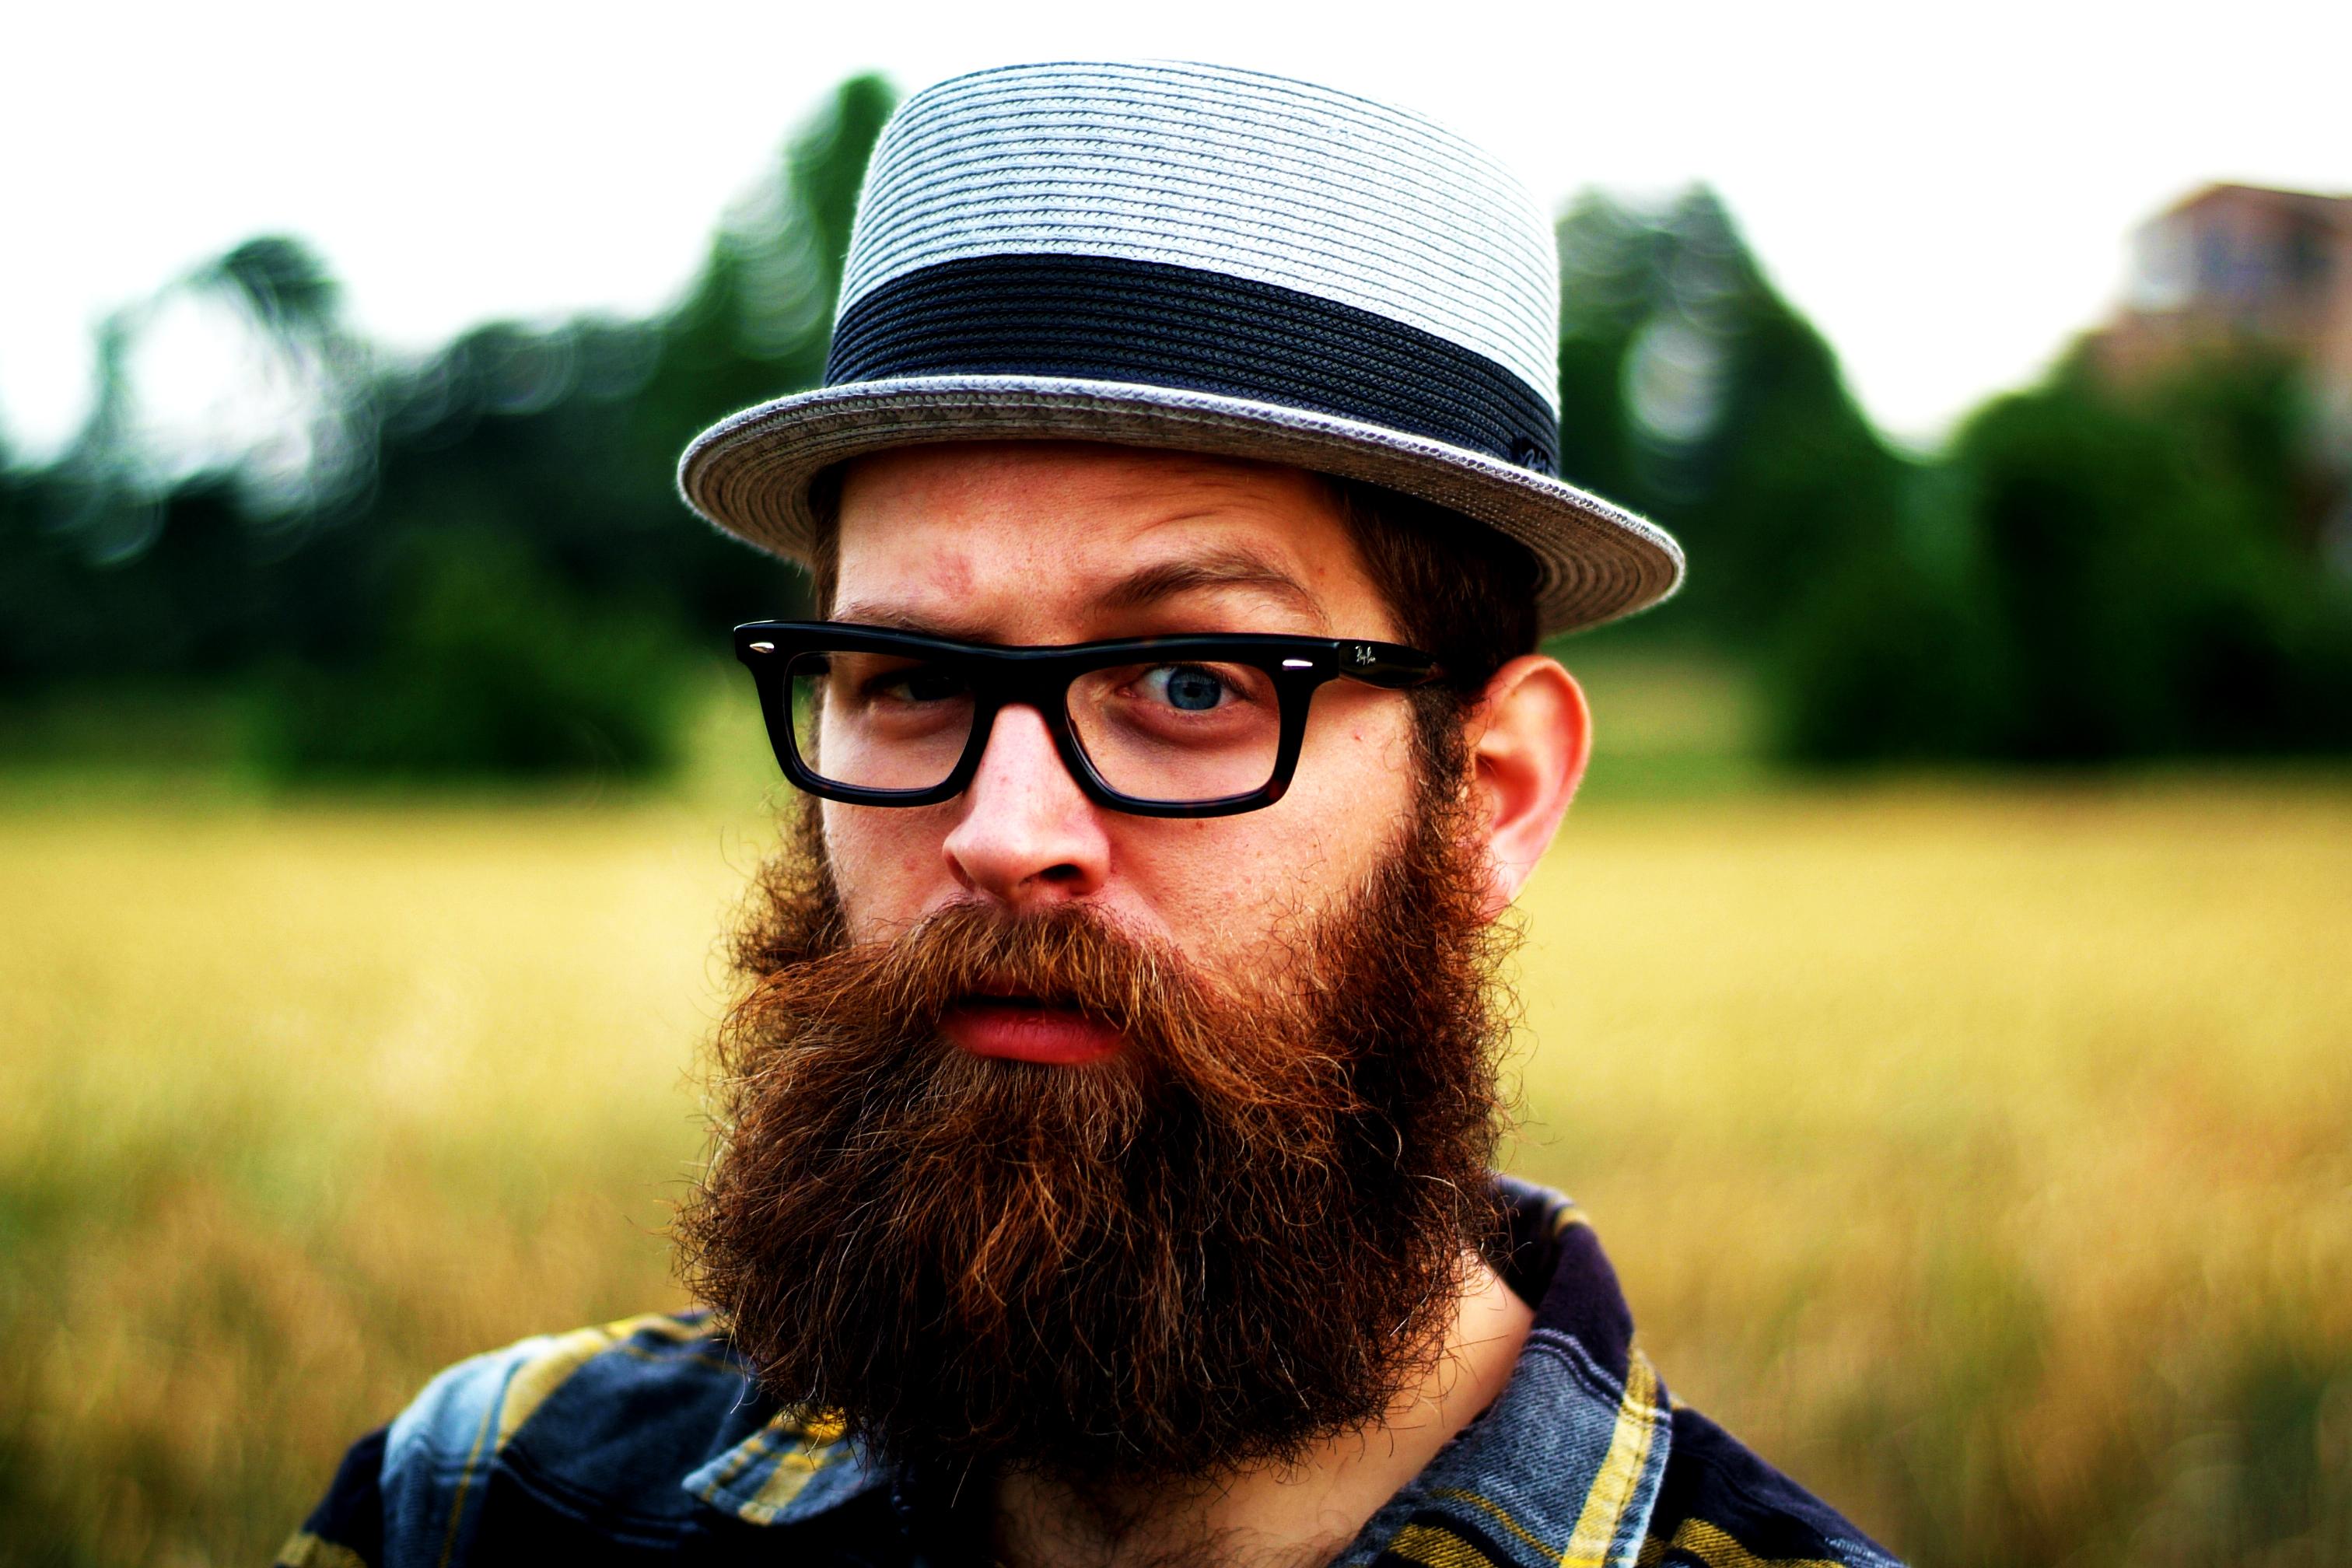 Beard oriented dating app